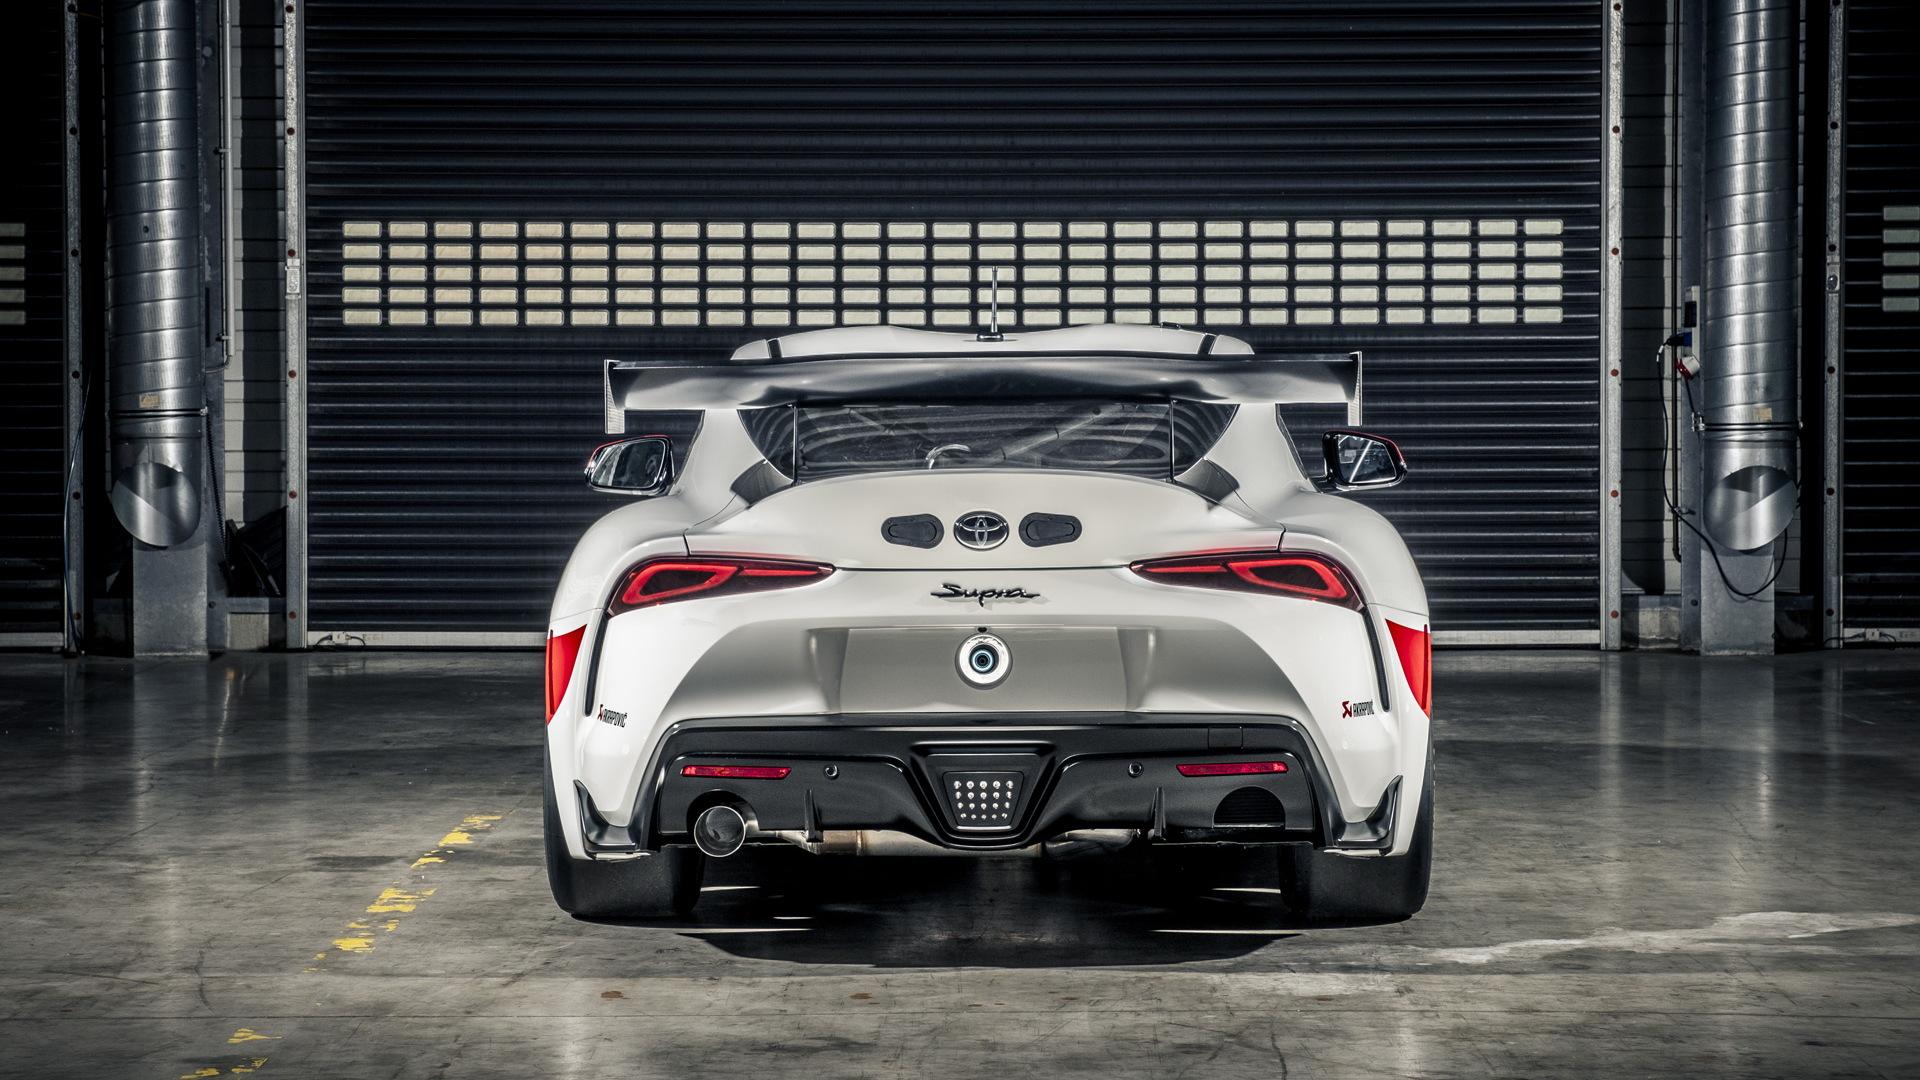 Toyota Supra GT4 race car concept